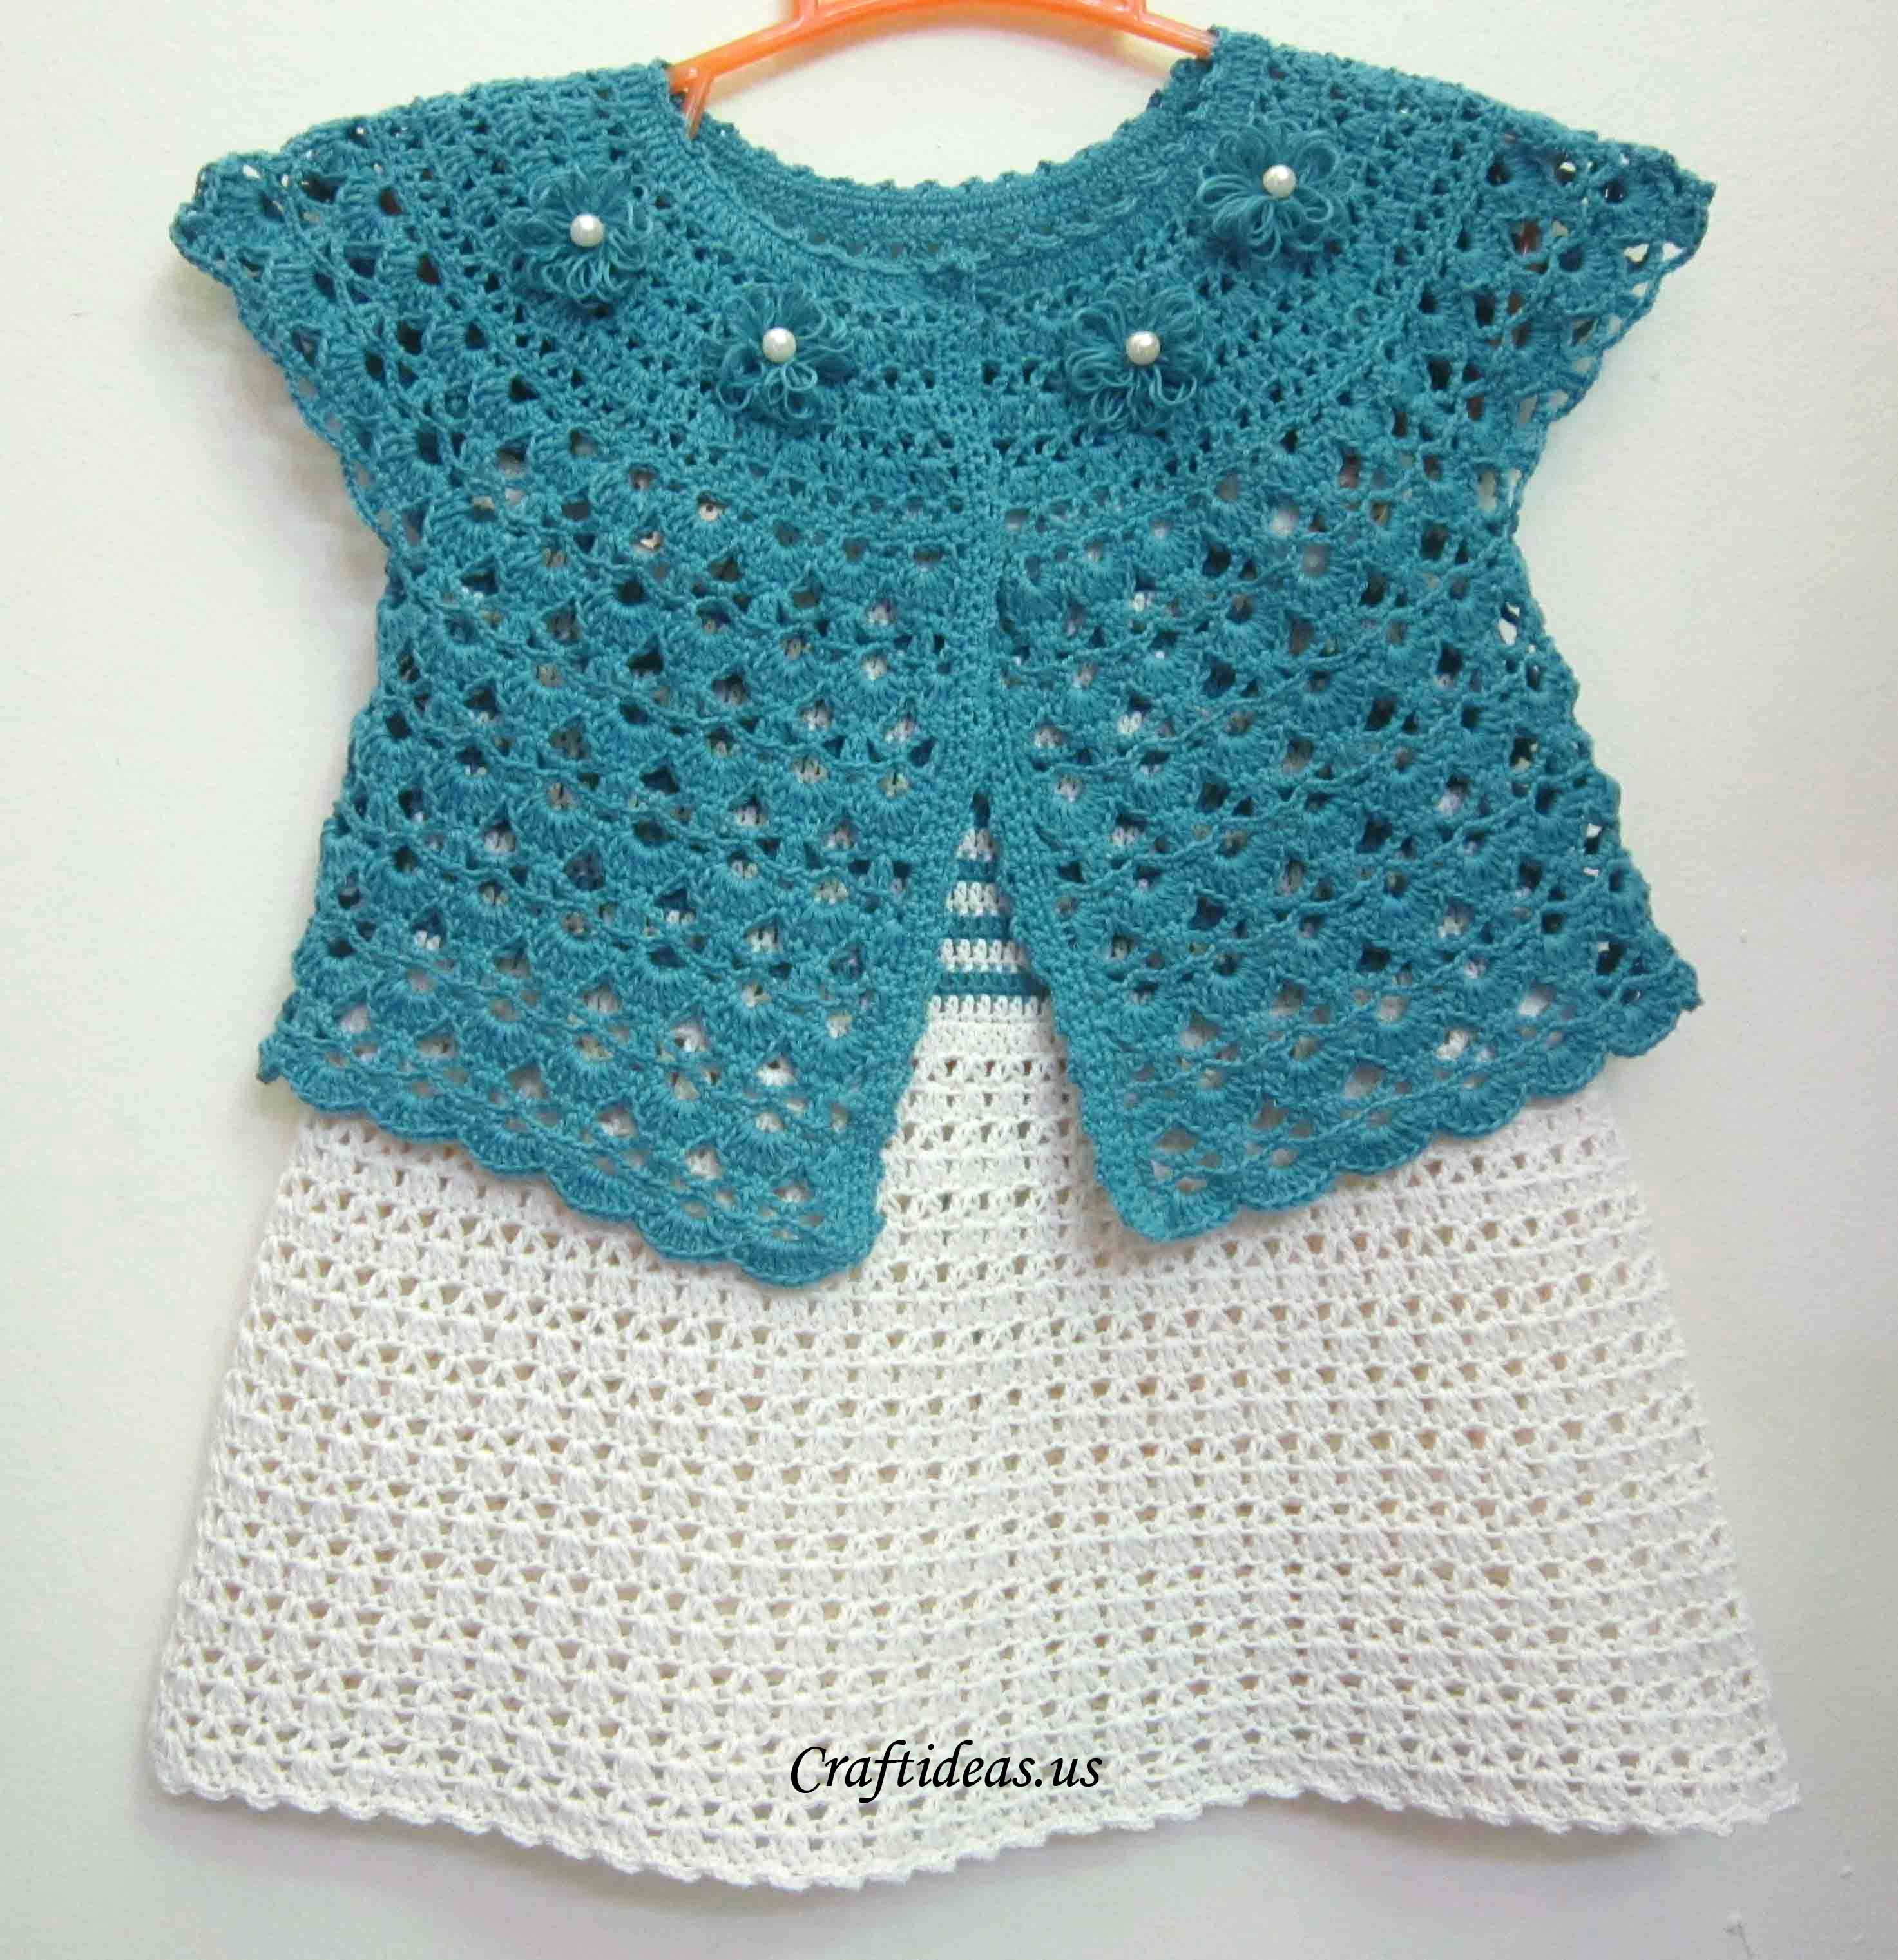 Crochet spring jacket craft ideas for Crochet crafts for kids